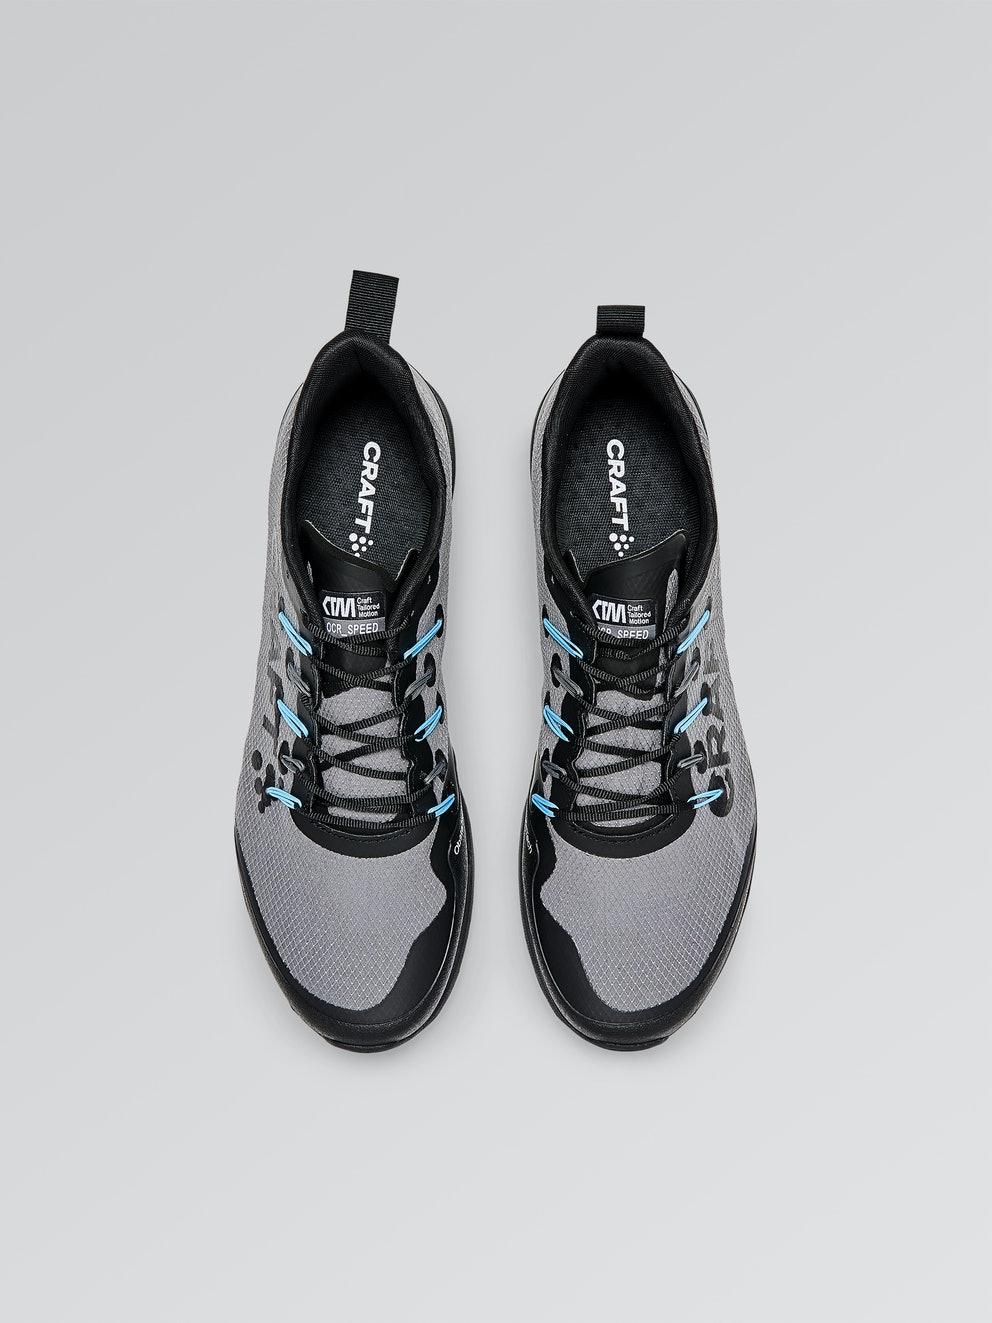 craft ocr ctm speed chaussure trail 2